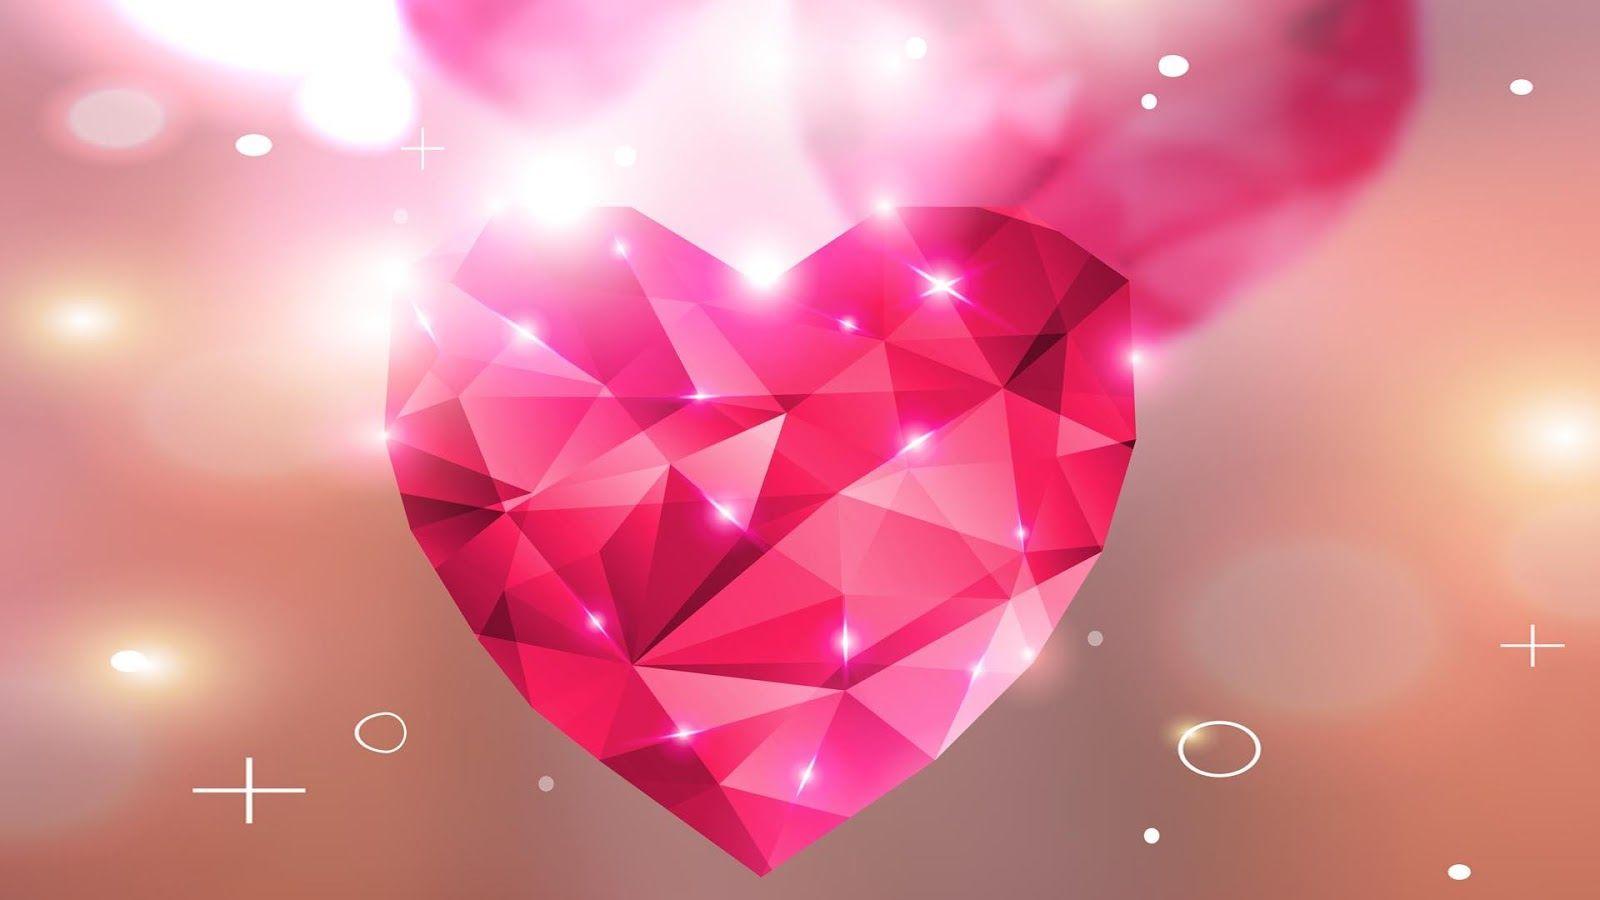 Heart Wallpaper For Desktop Heart Wallpaper Heart Wallpaper Hd Elephant Wallpaper Heart wallpaper hd 1080p free download